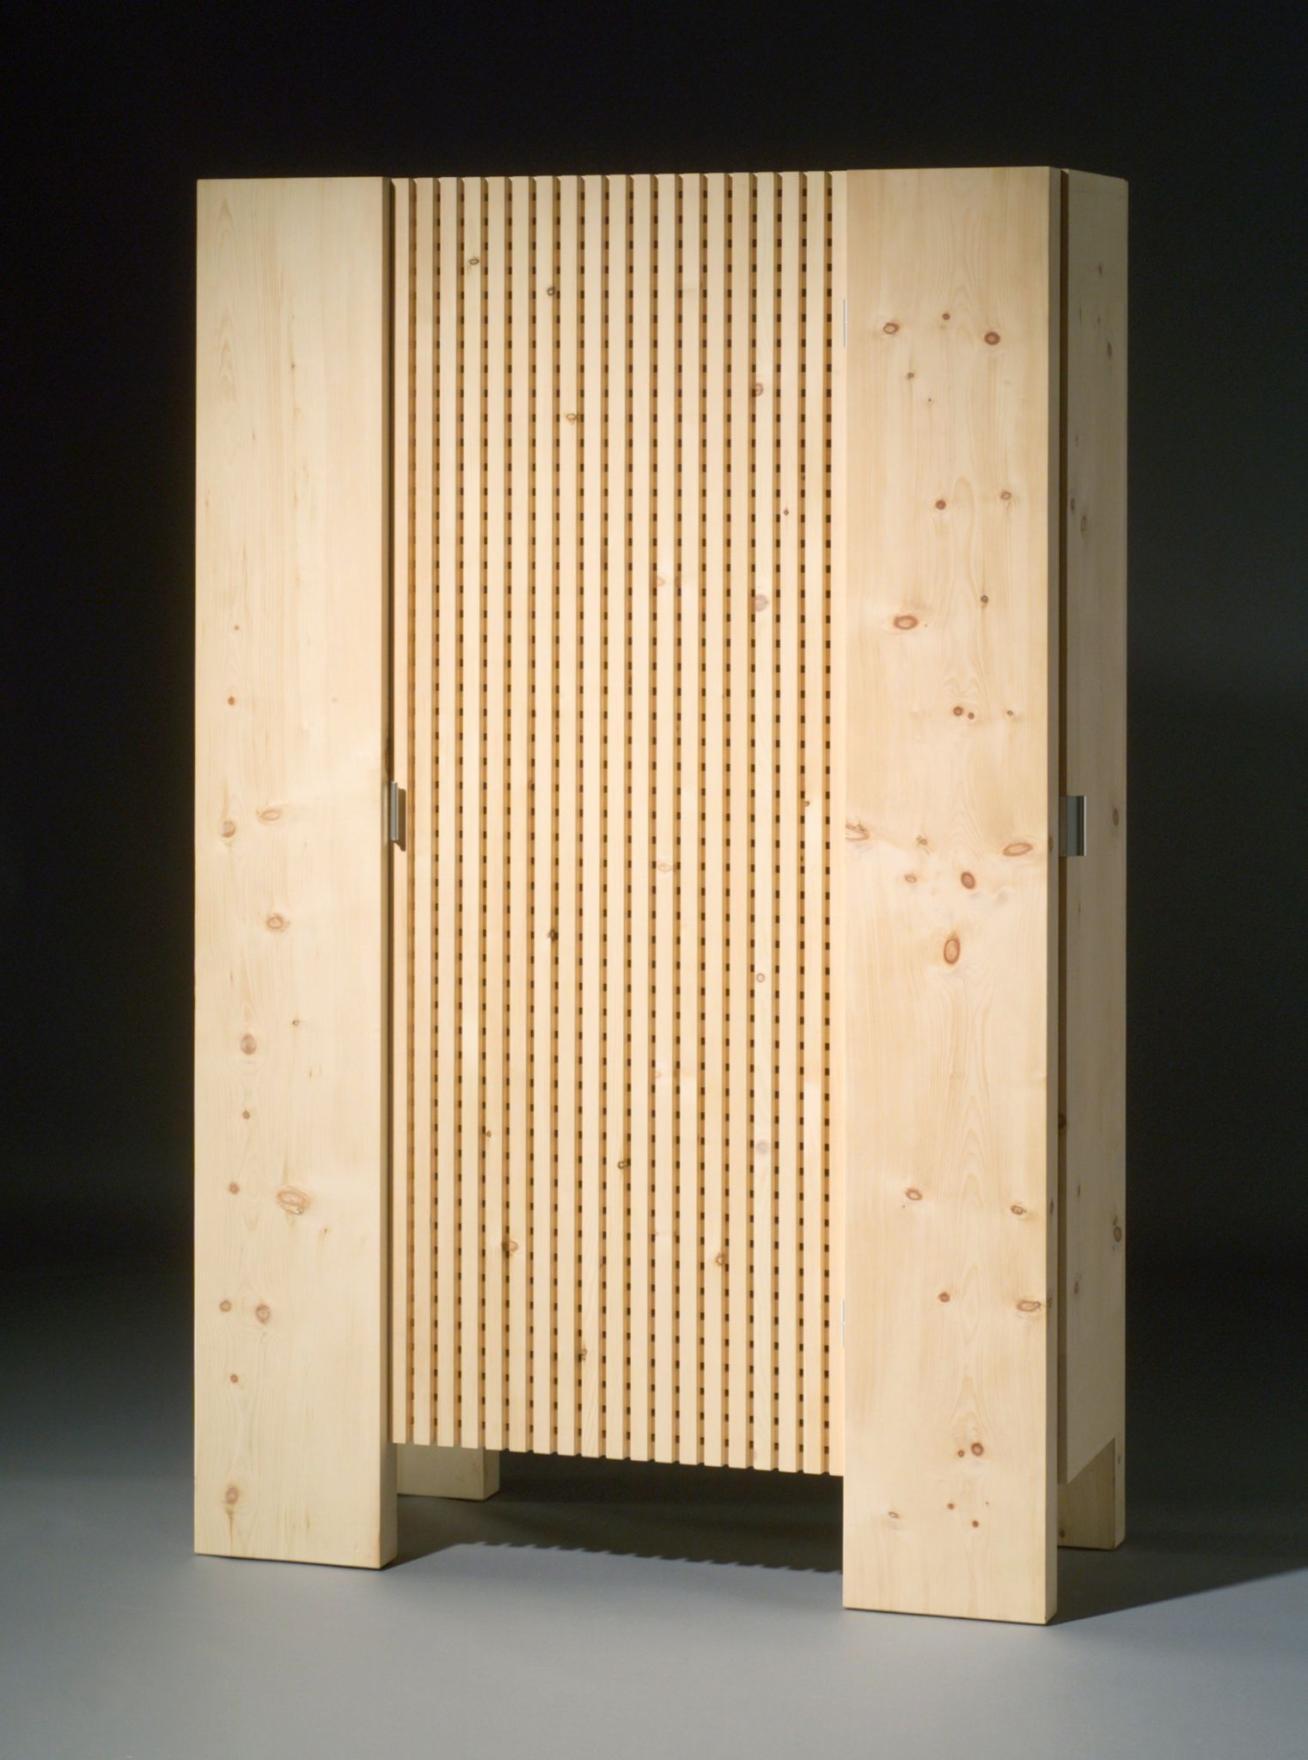 kasten-modulor-2001-foto-stefan-rohner